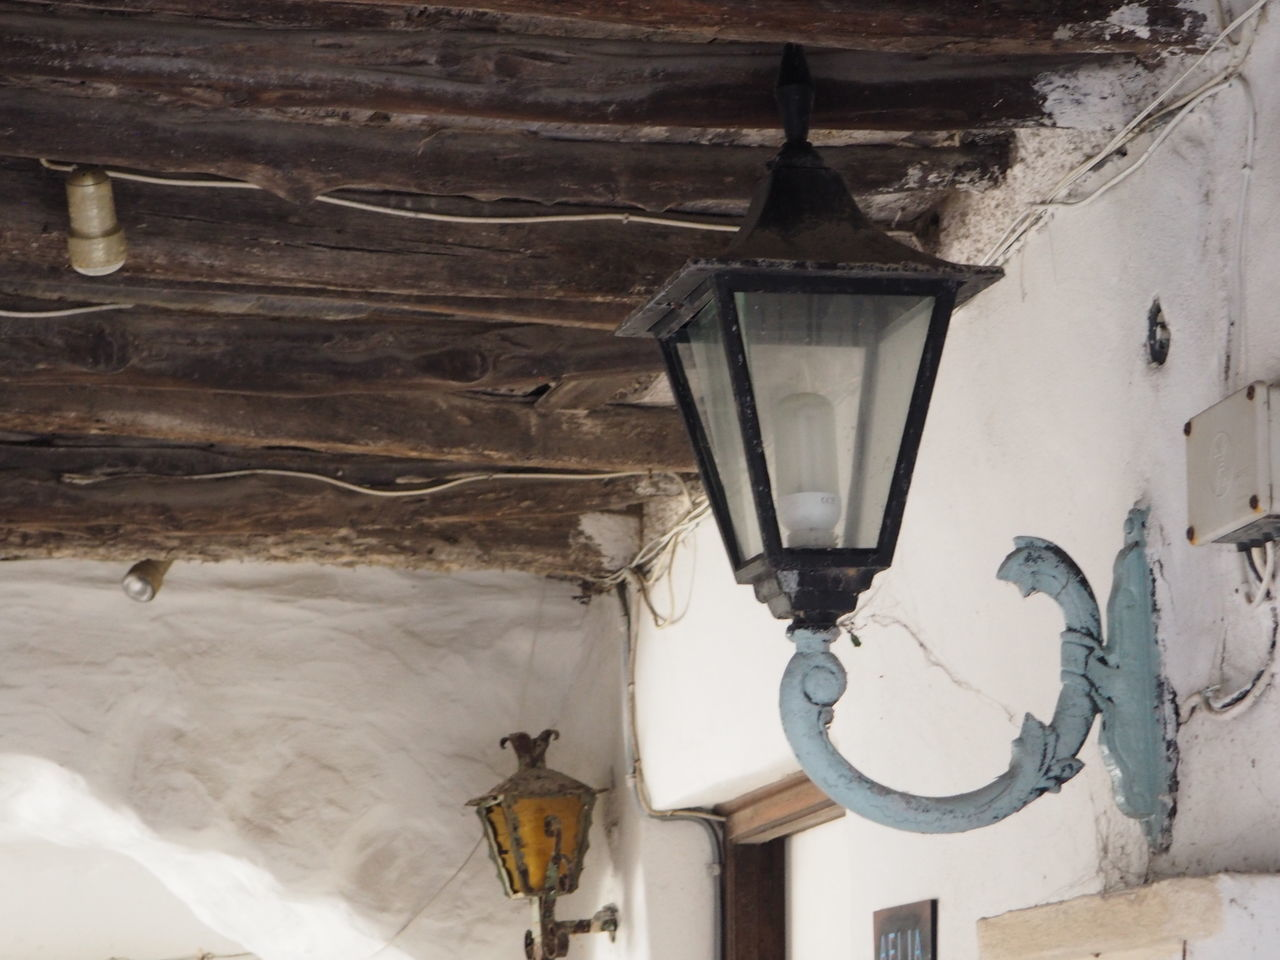 Close-up Fixture Hanging Lantern Lantern Light Old Old Buildings